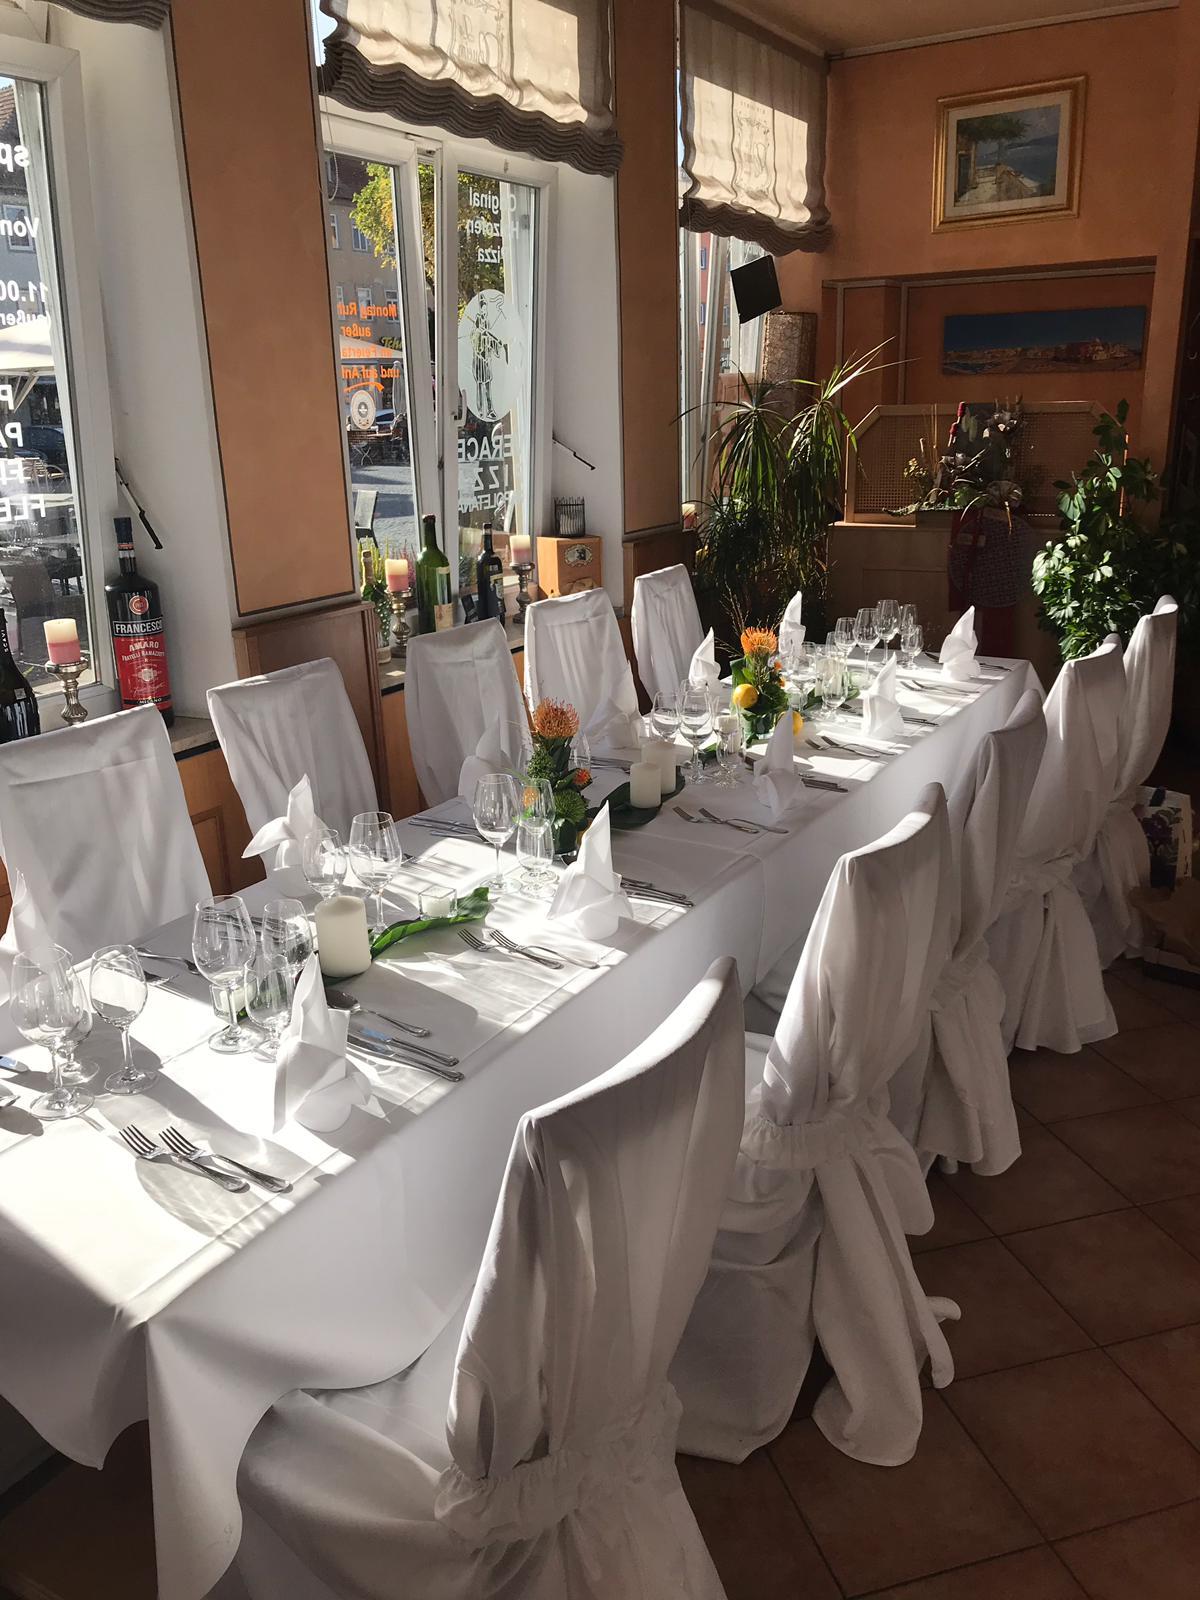 italienisches restaurant nach neapolitanischer k che la cucina di francesco bad neustadt a d. Black Bedroom Furniture Sets. Home Design Ideas